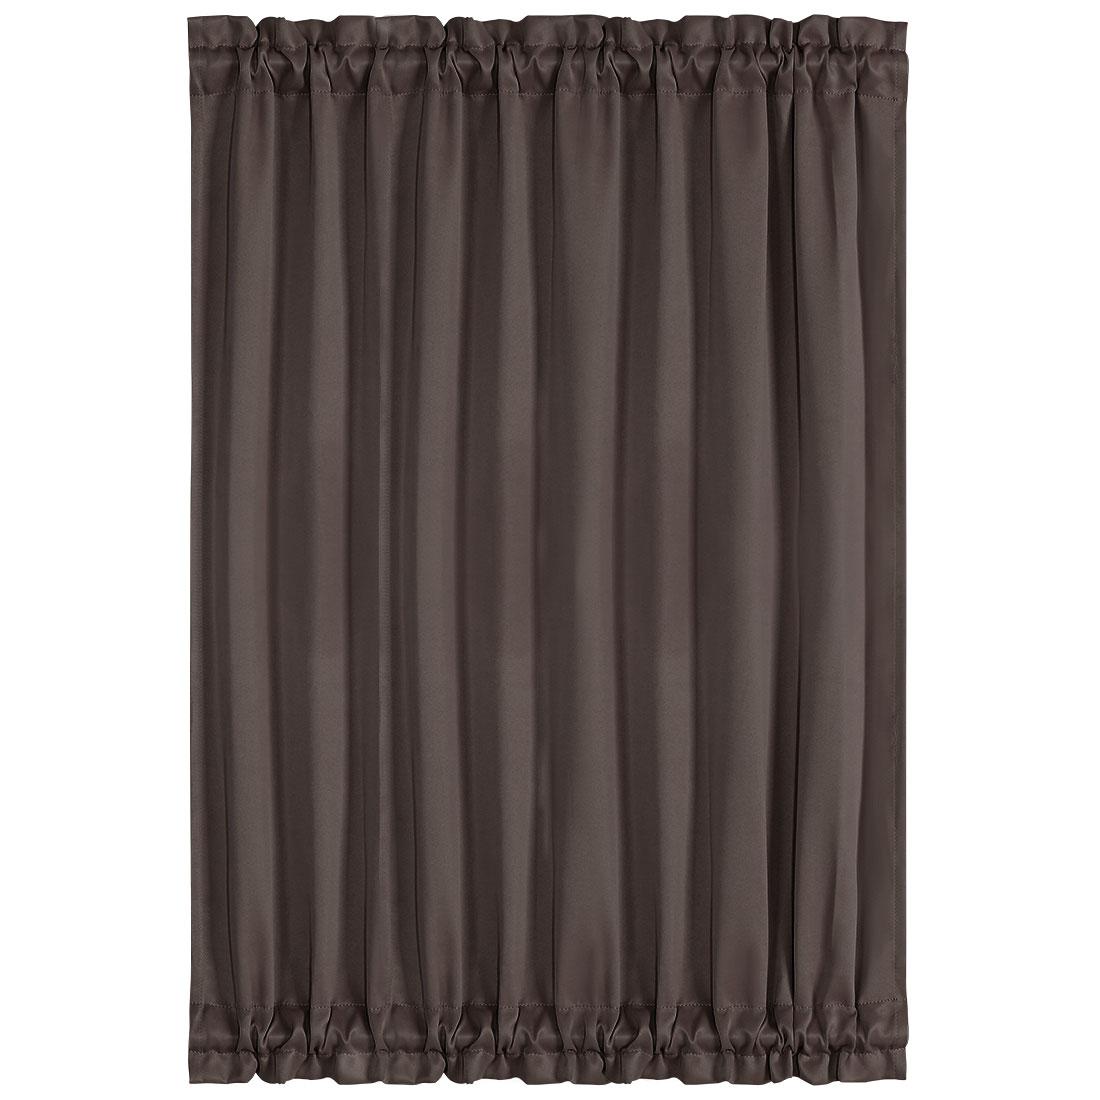 Elegant 54 x 72 Inch Blackout Curtains Rod Sliding Door Drapes Coffee Color